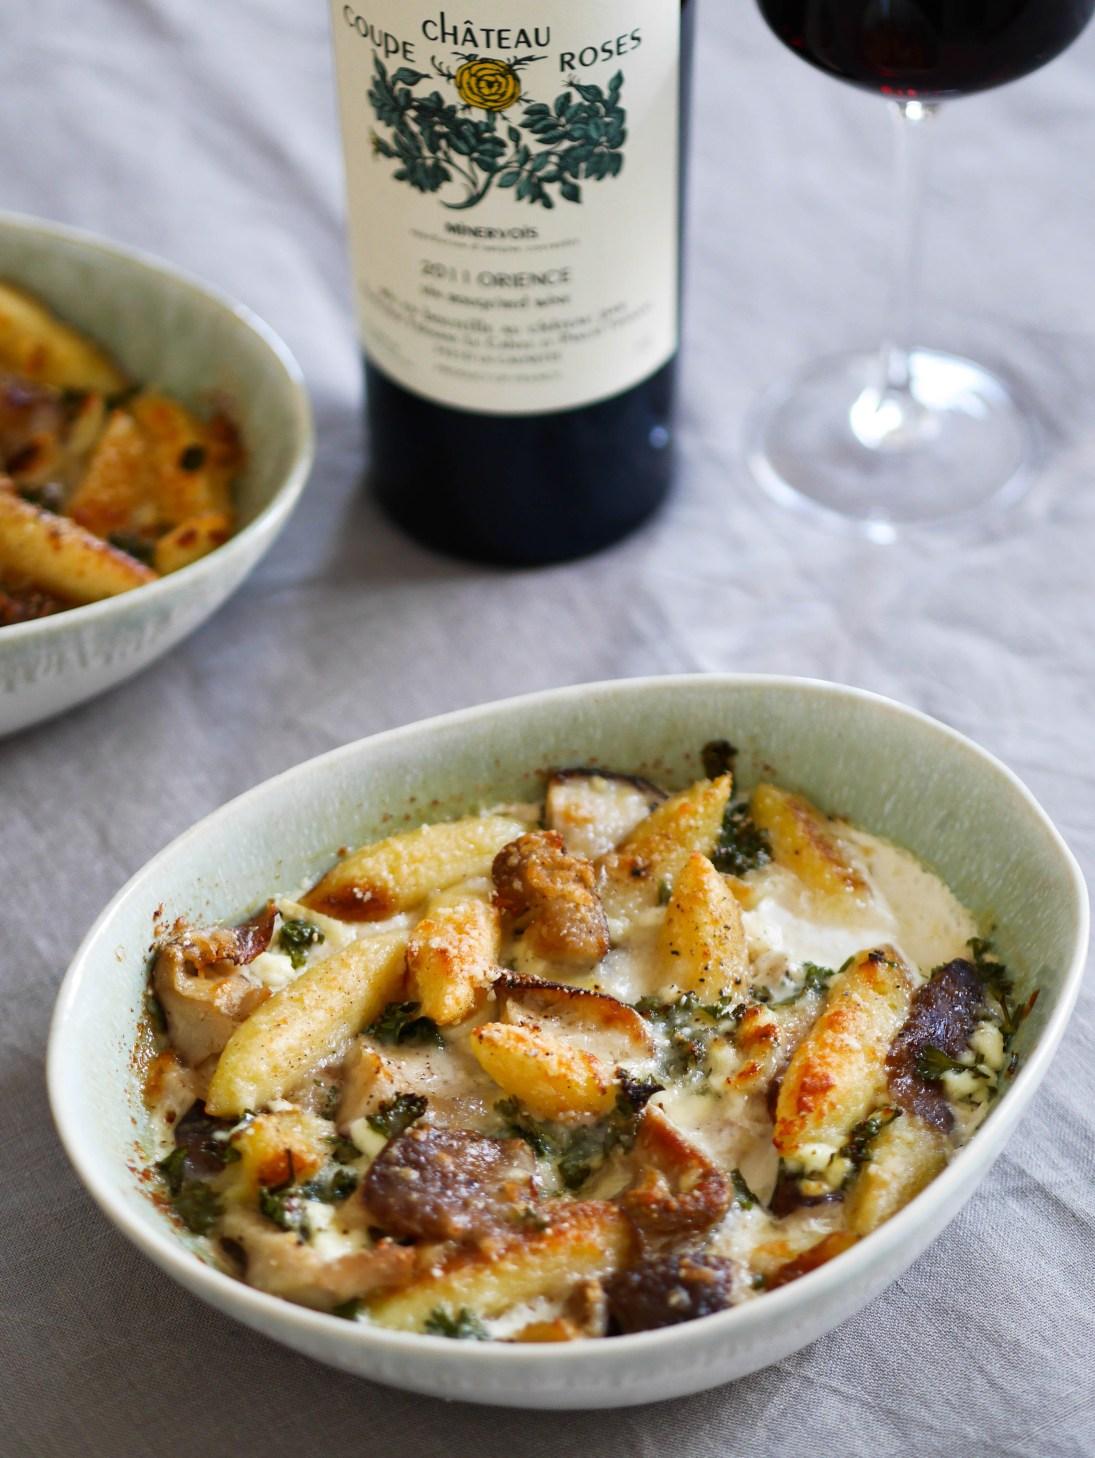 woodmoodfood-blog-culinaire-recette-simple-facile-gourmande-gnocchis-gratinés-schneider-food